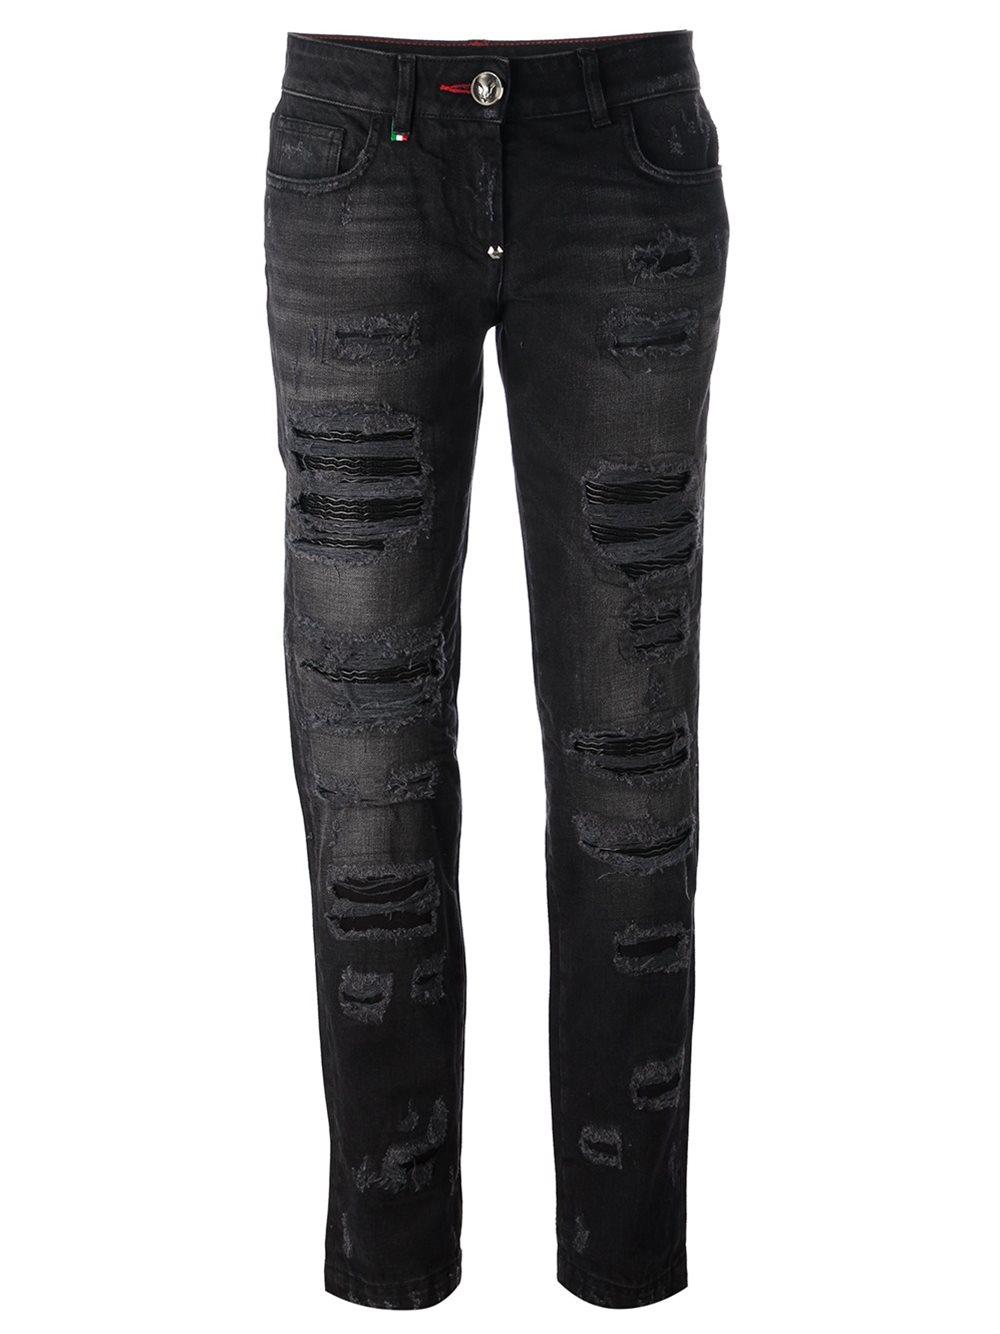 lyst philipp plein distressed boyfriend jeans in black for men. Black Bedroom Furniture Sets. Home Design Ideas